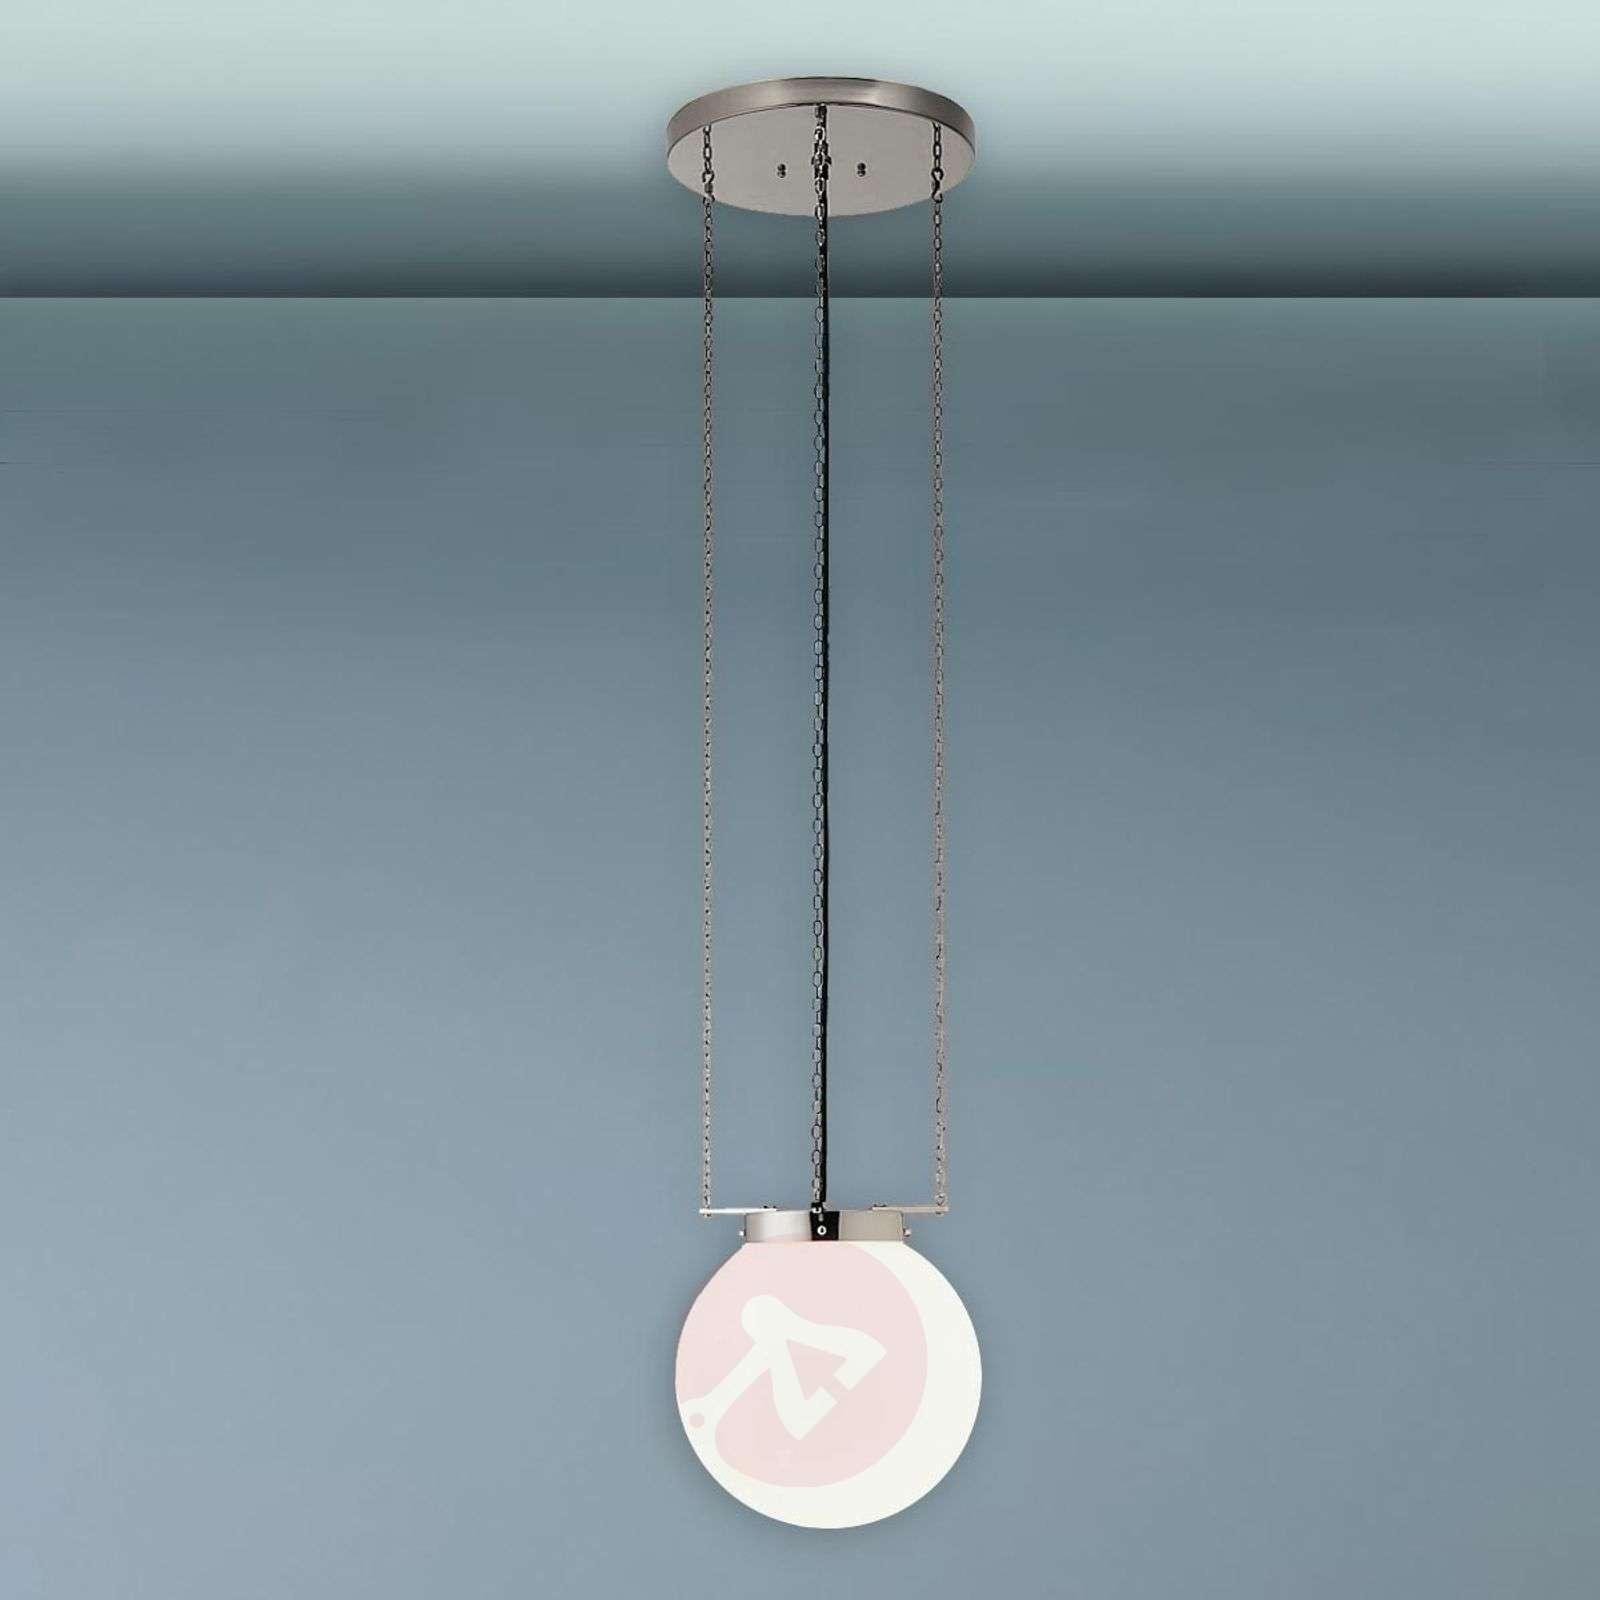 Hanging light in the Bauhaus style, nickel-9030144X-01